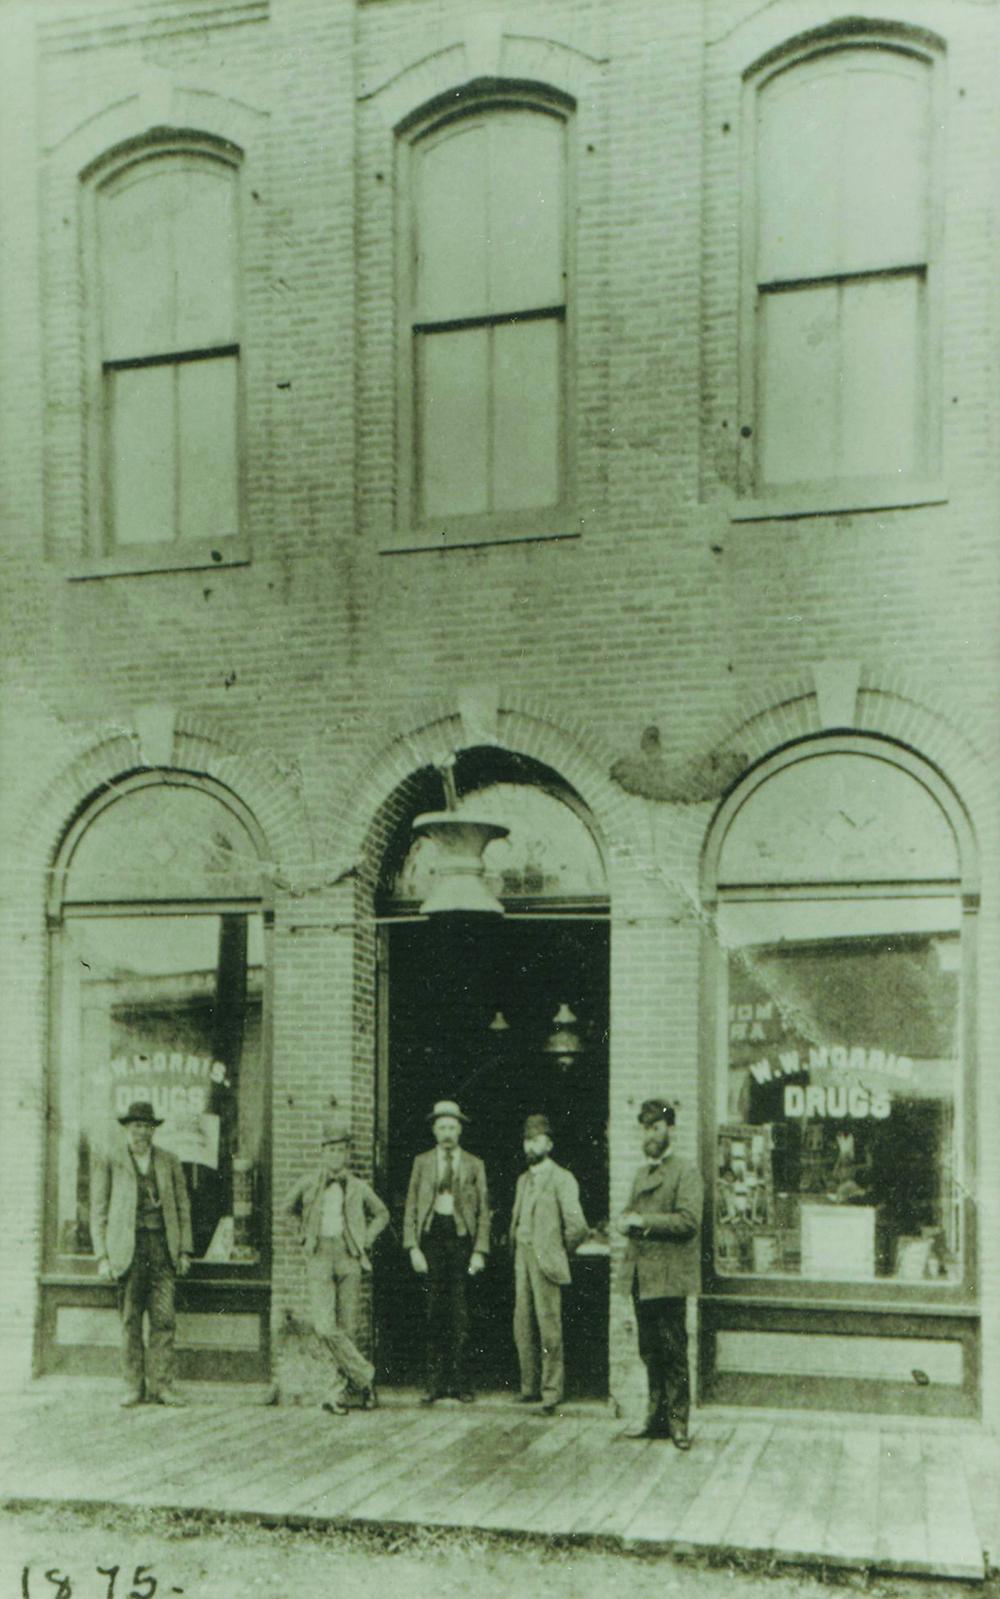 1875 - Main Street